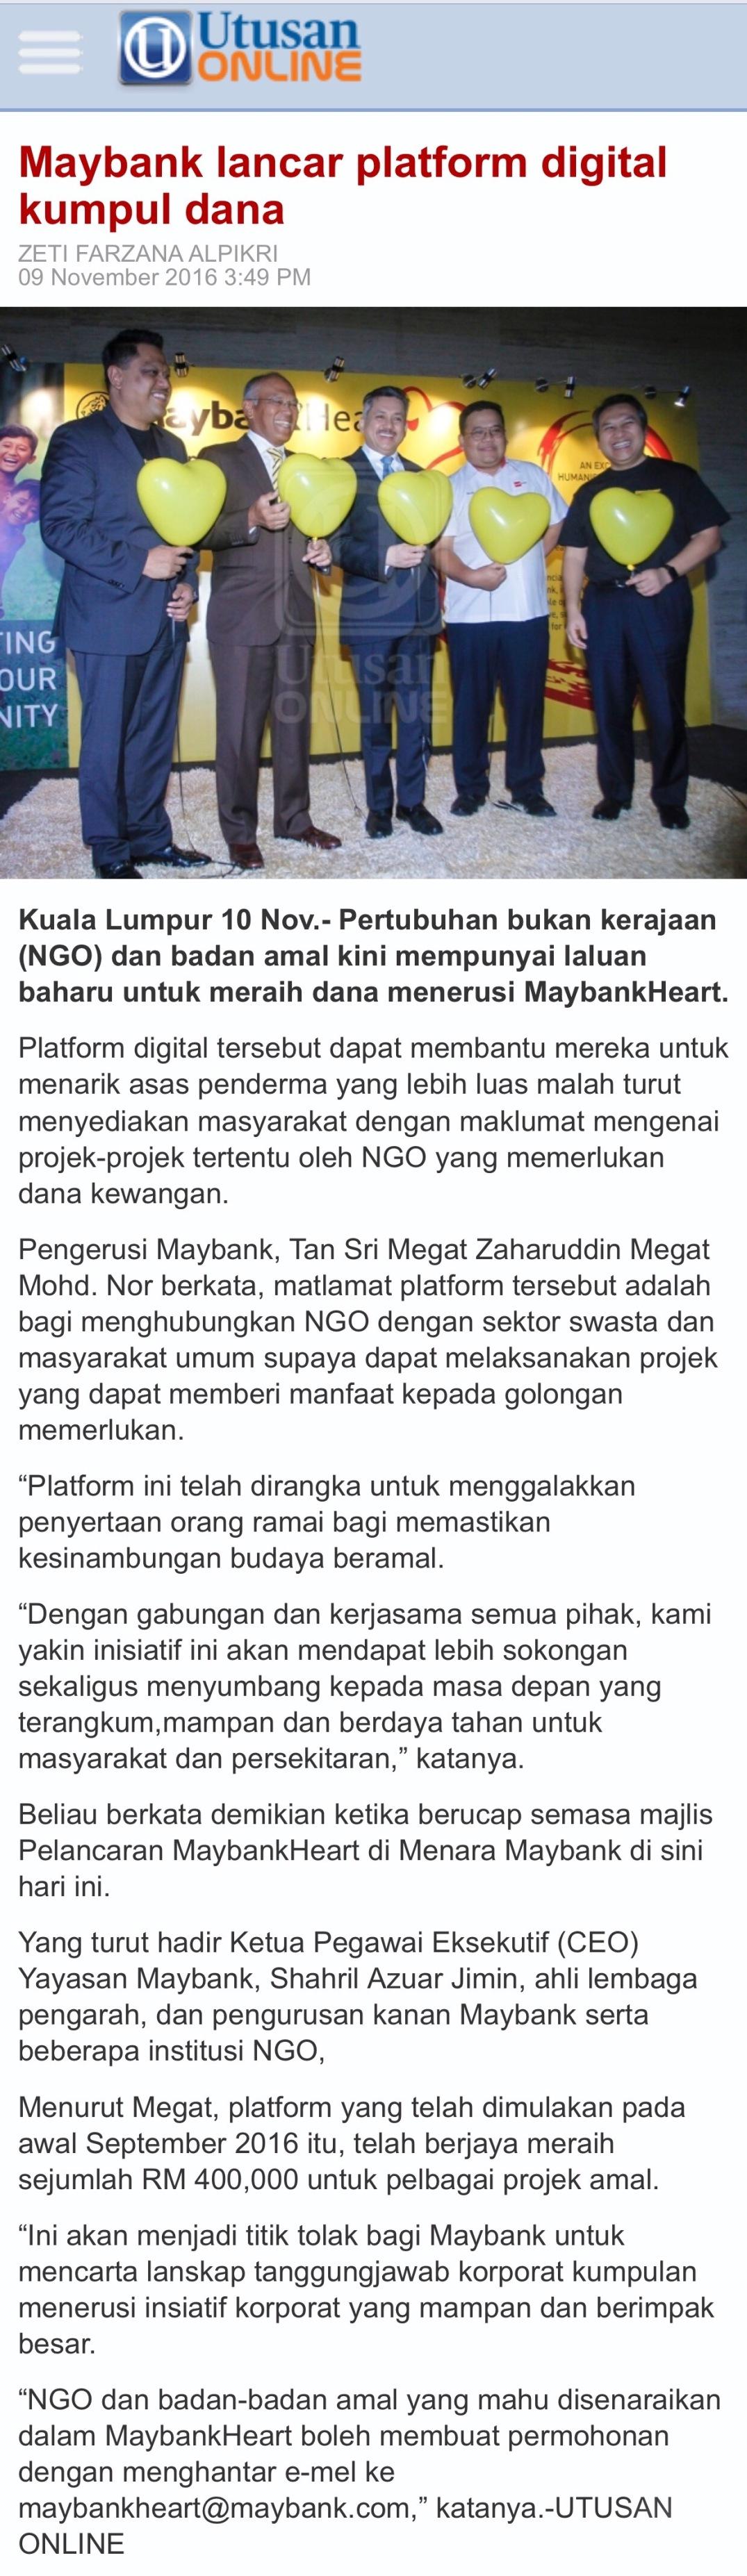 utusan-online-maybank-lancar-platform-digital-kumpul-dana-161109